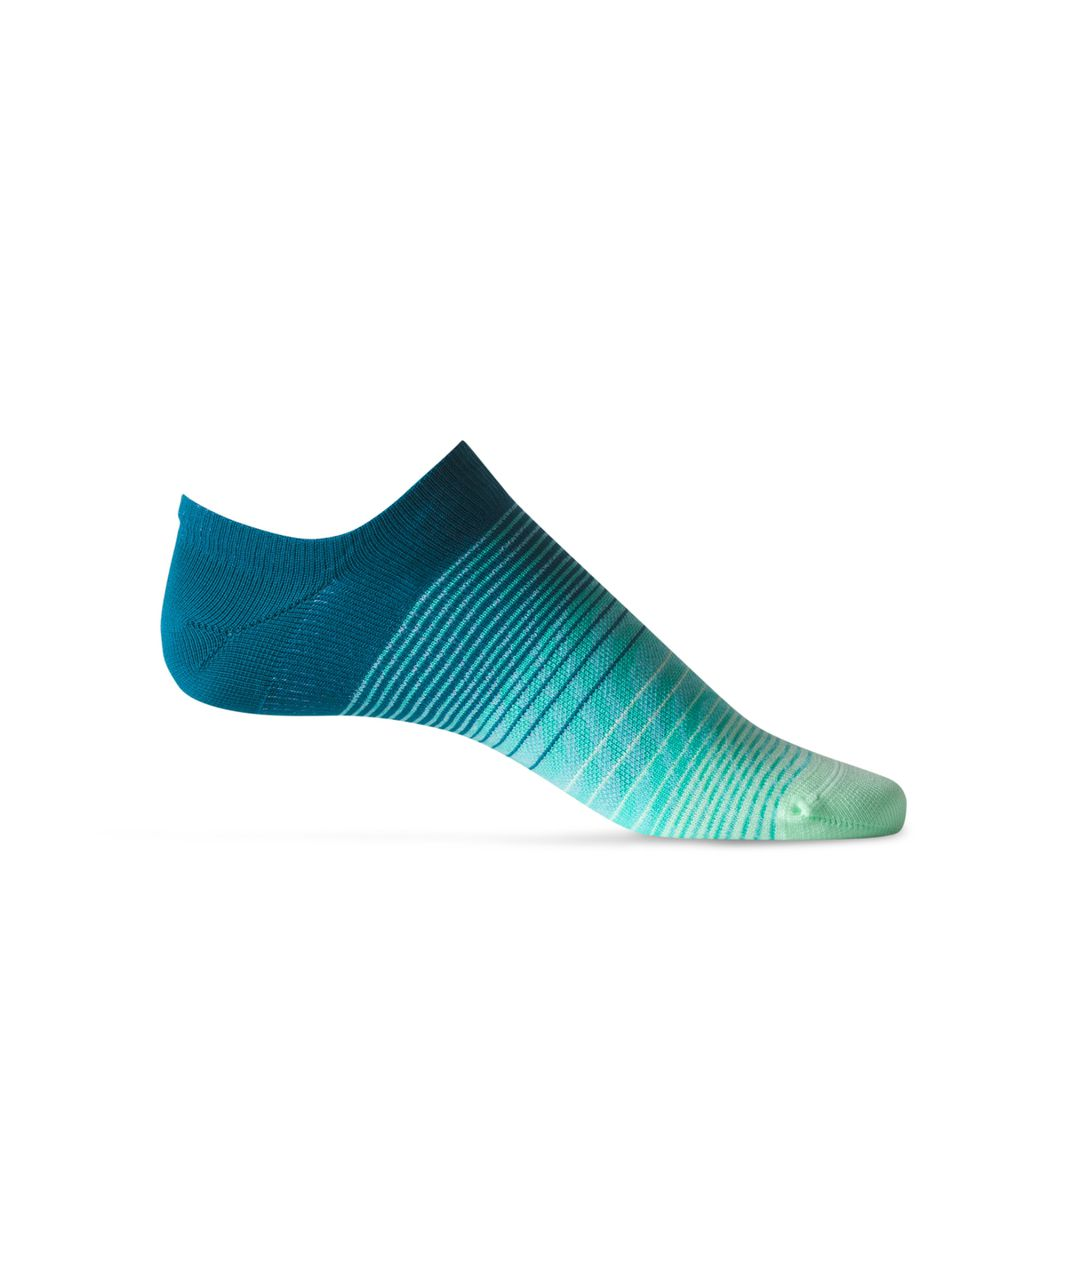 Lululemon Play All Day Sock - Fresh Teal / Bali Breeze / Tofino Teal